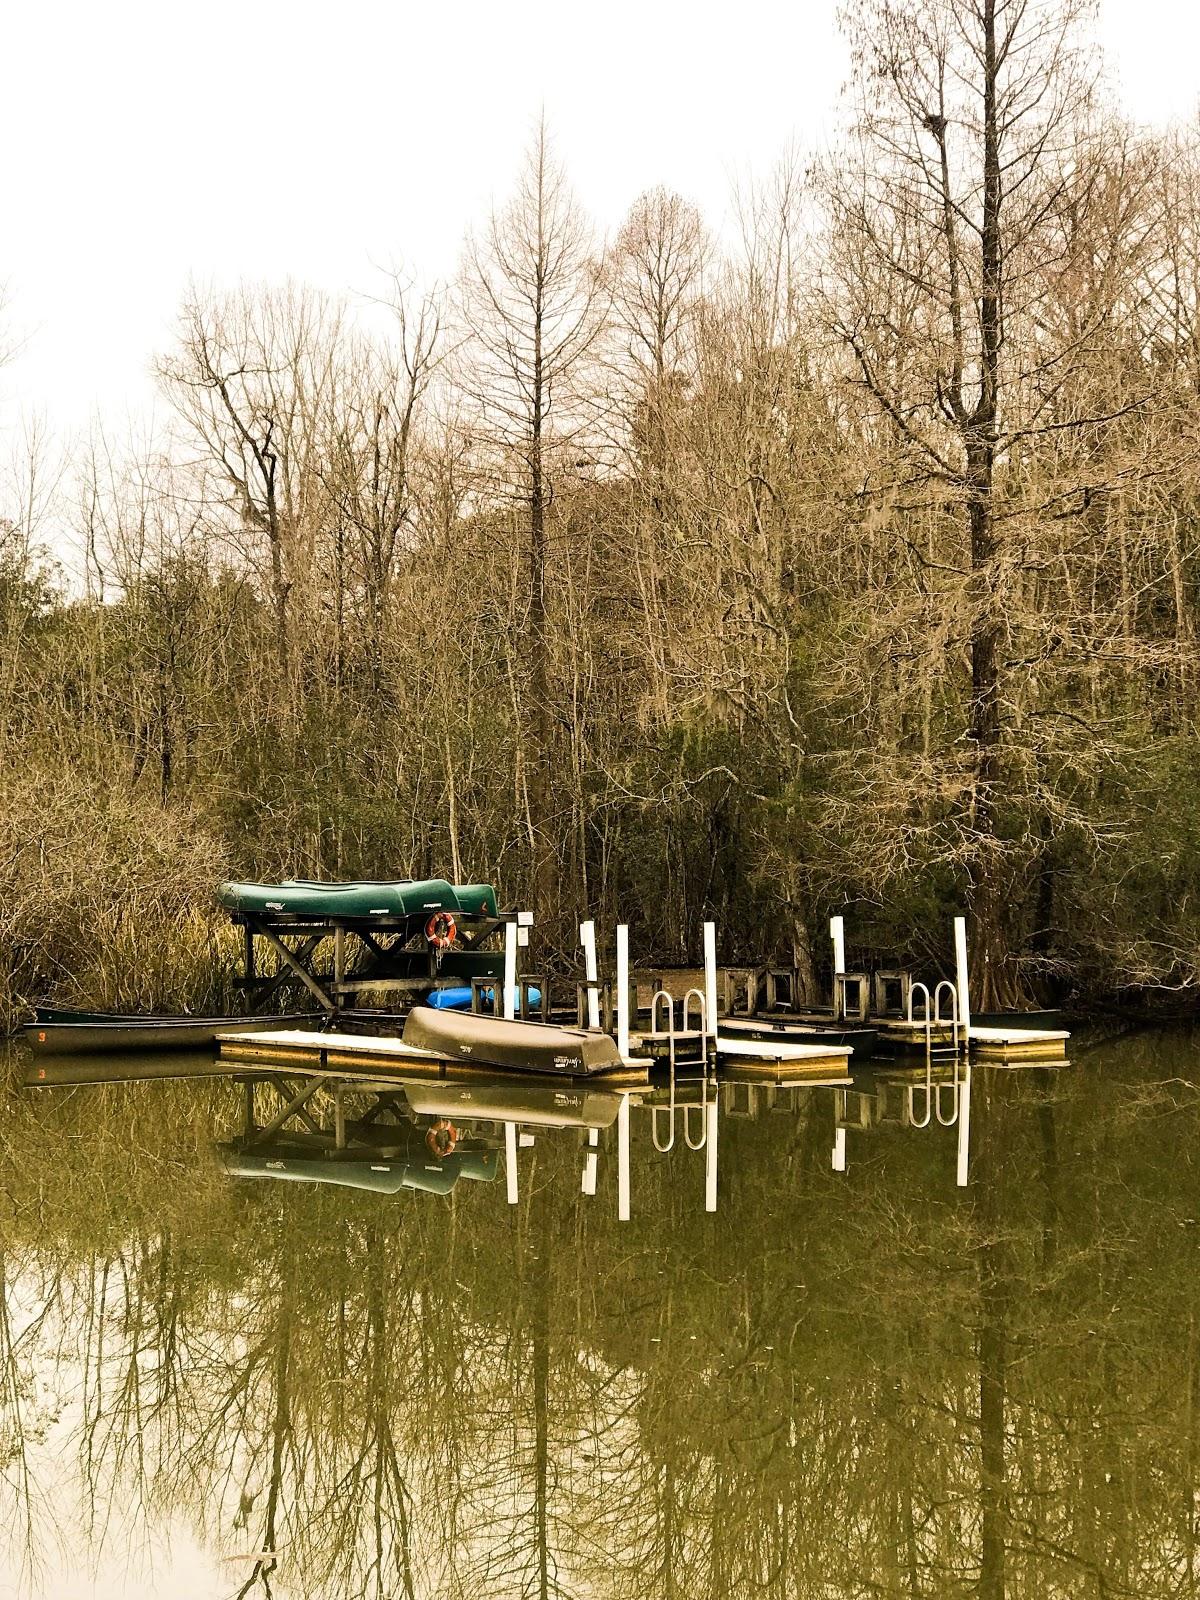 Santee Canal Boats.jpg